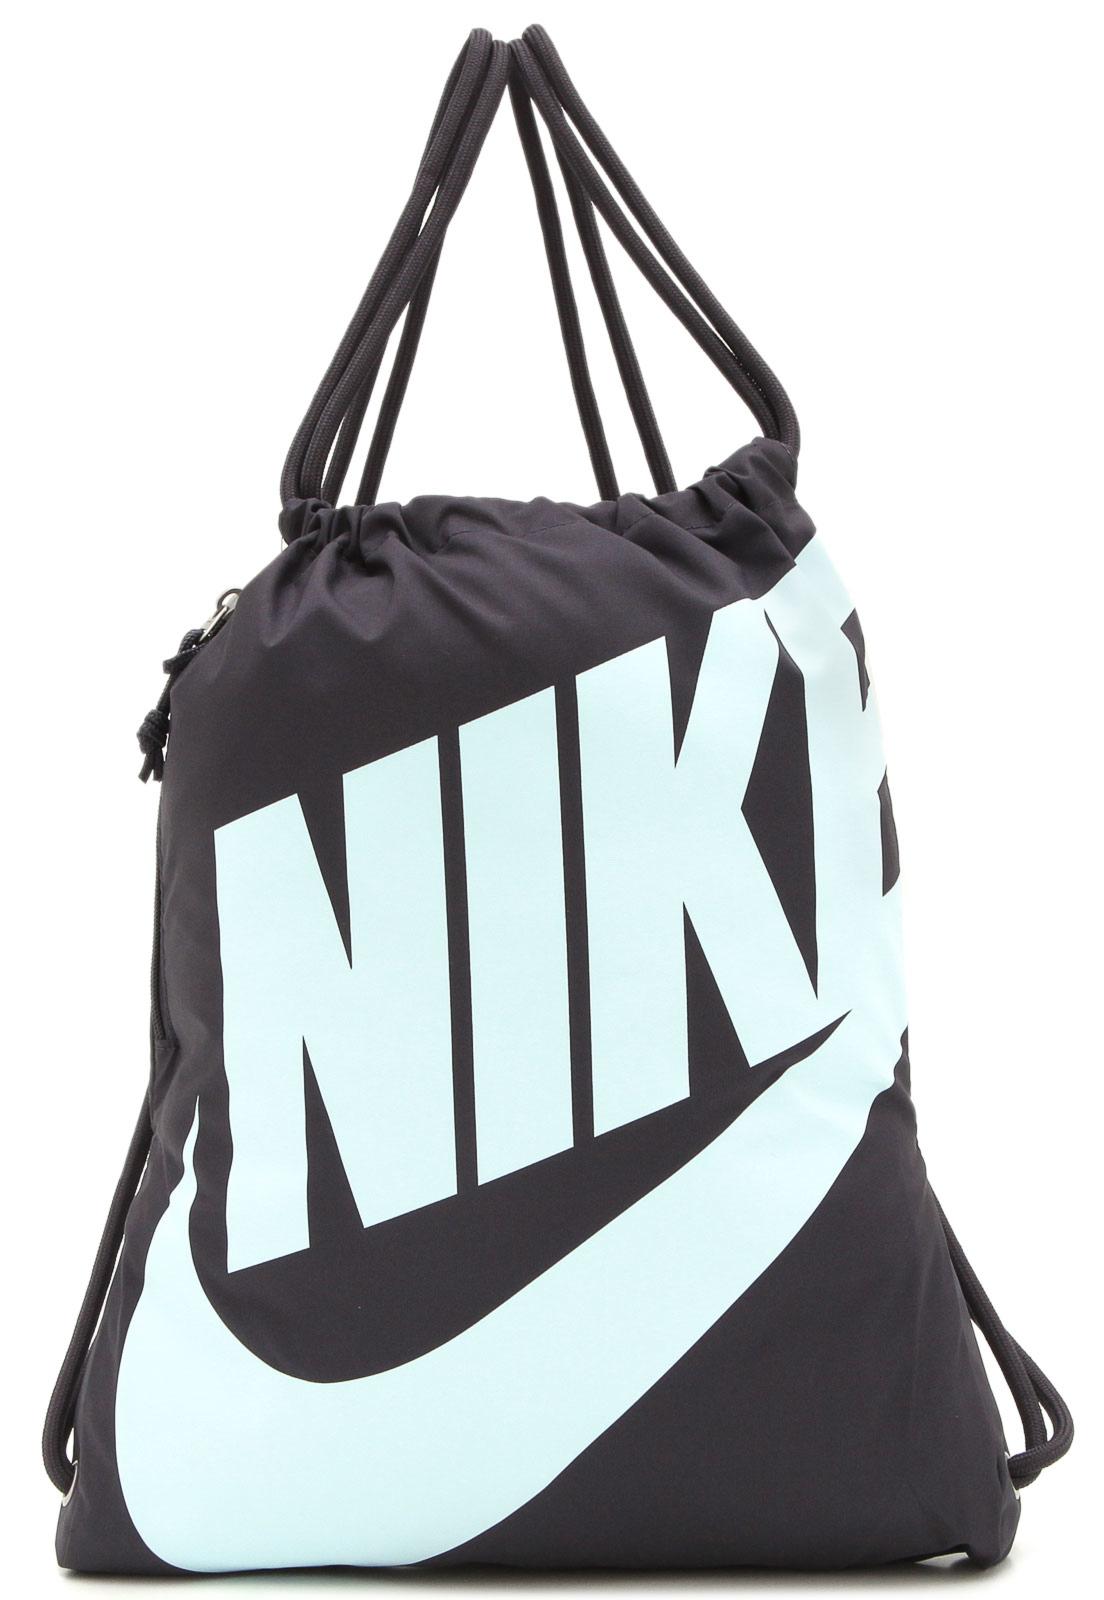 Mochilas saco: Nike | Redbubble